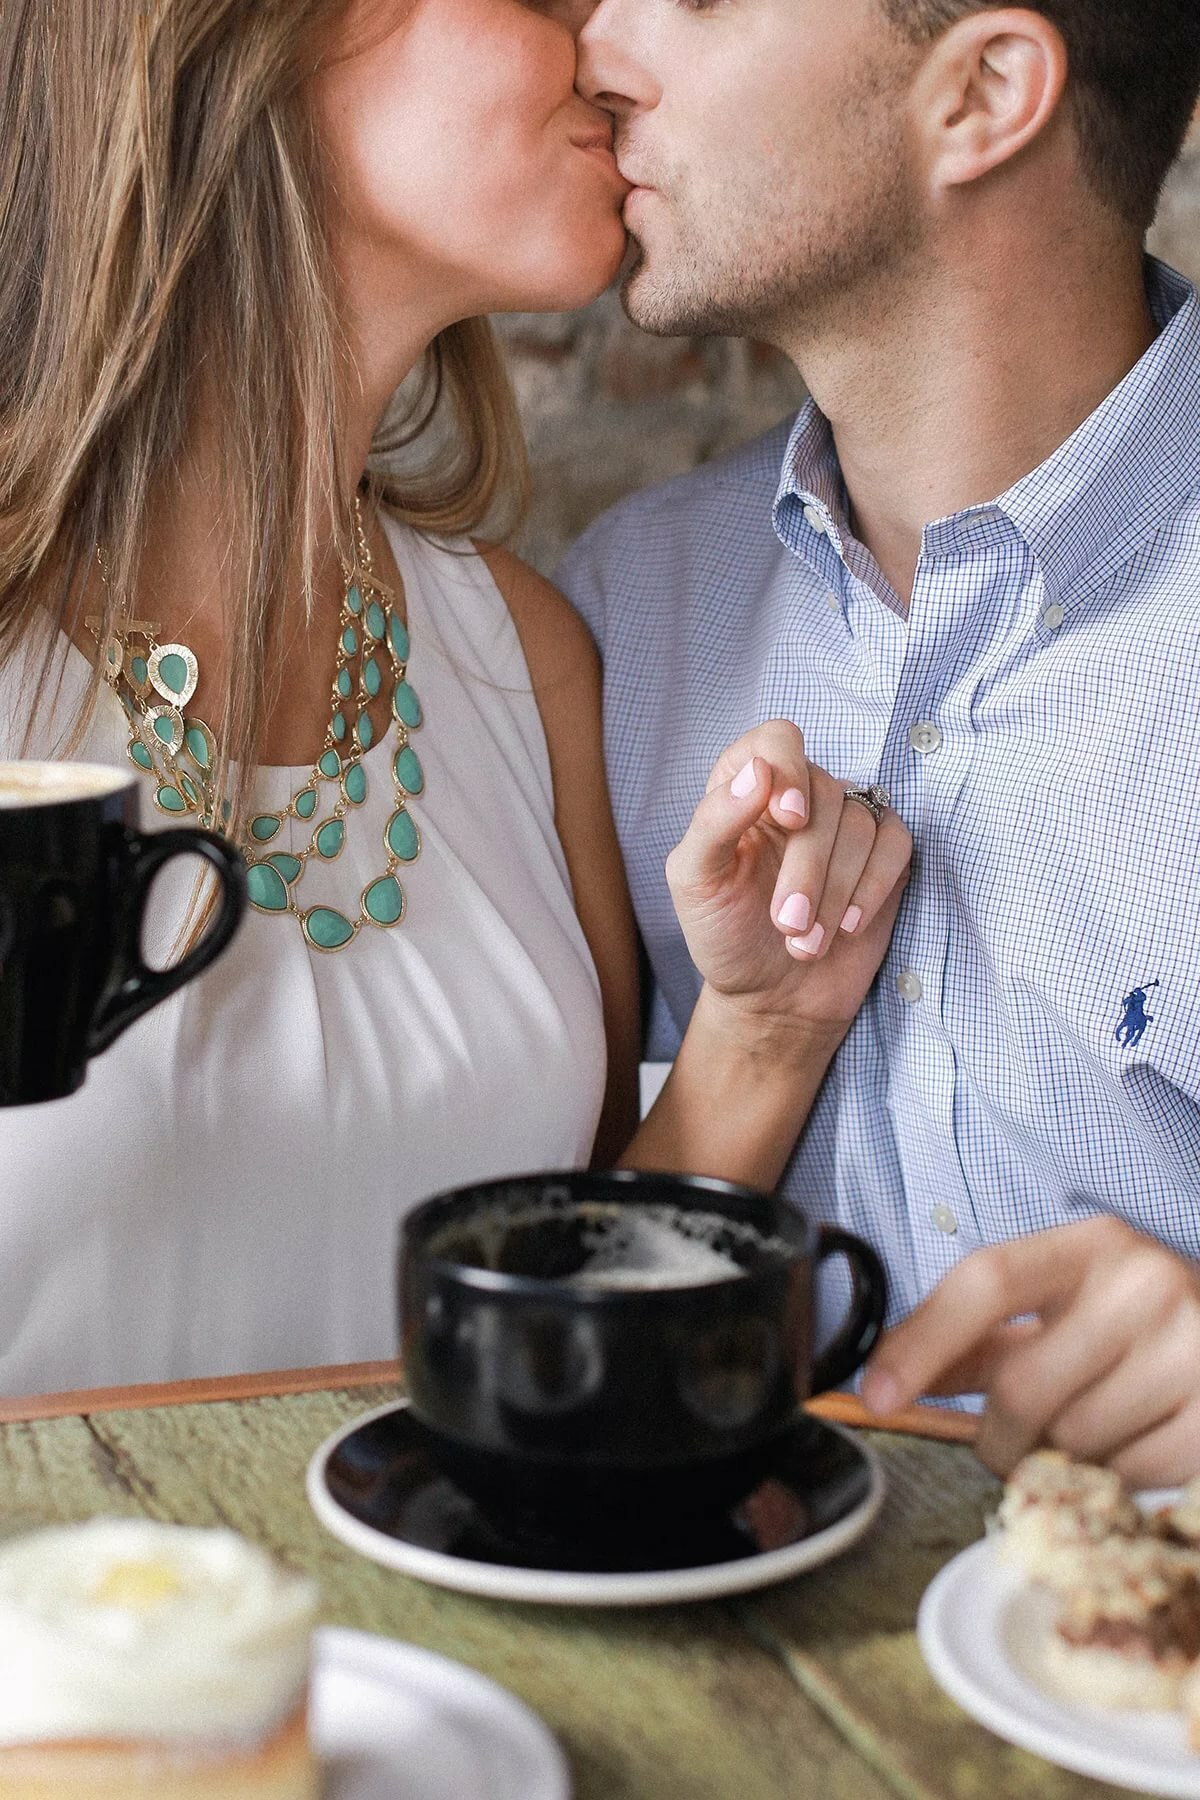 утренний поцелуй для любимого картинки зайдя кинозал, специально